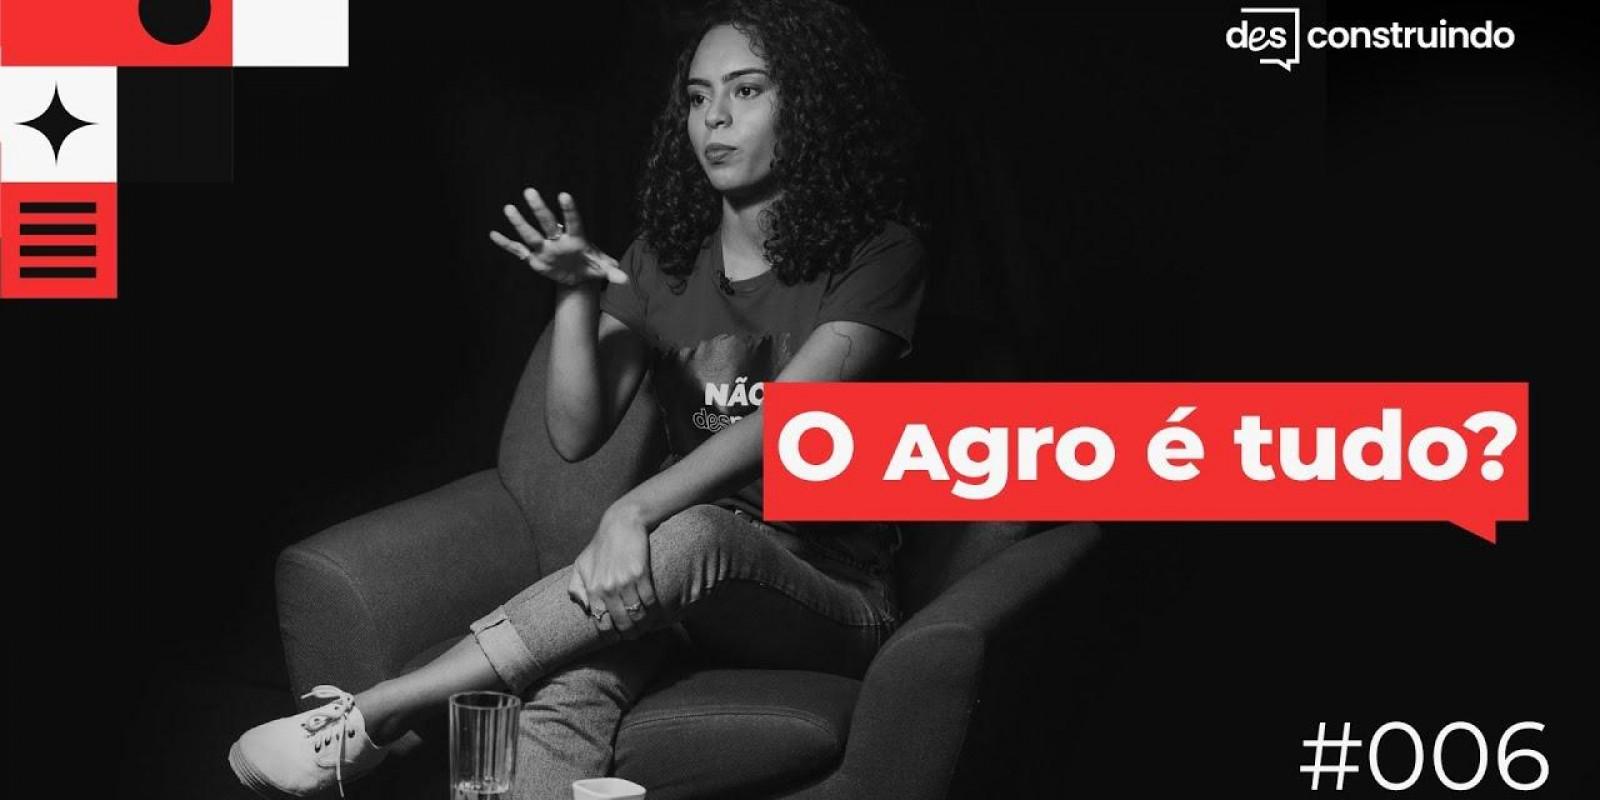 Canal Desconstruindo - Crise Ambiental - O Agro É Tudo?